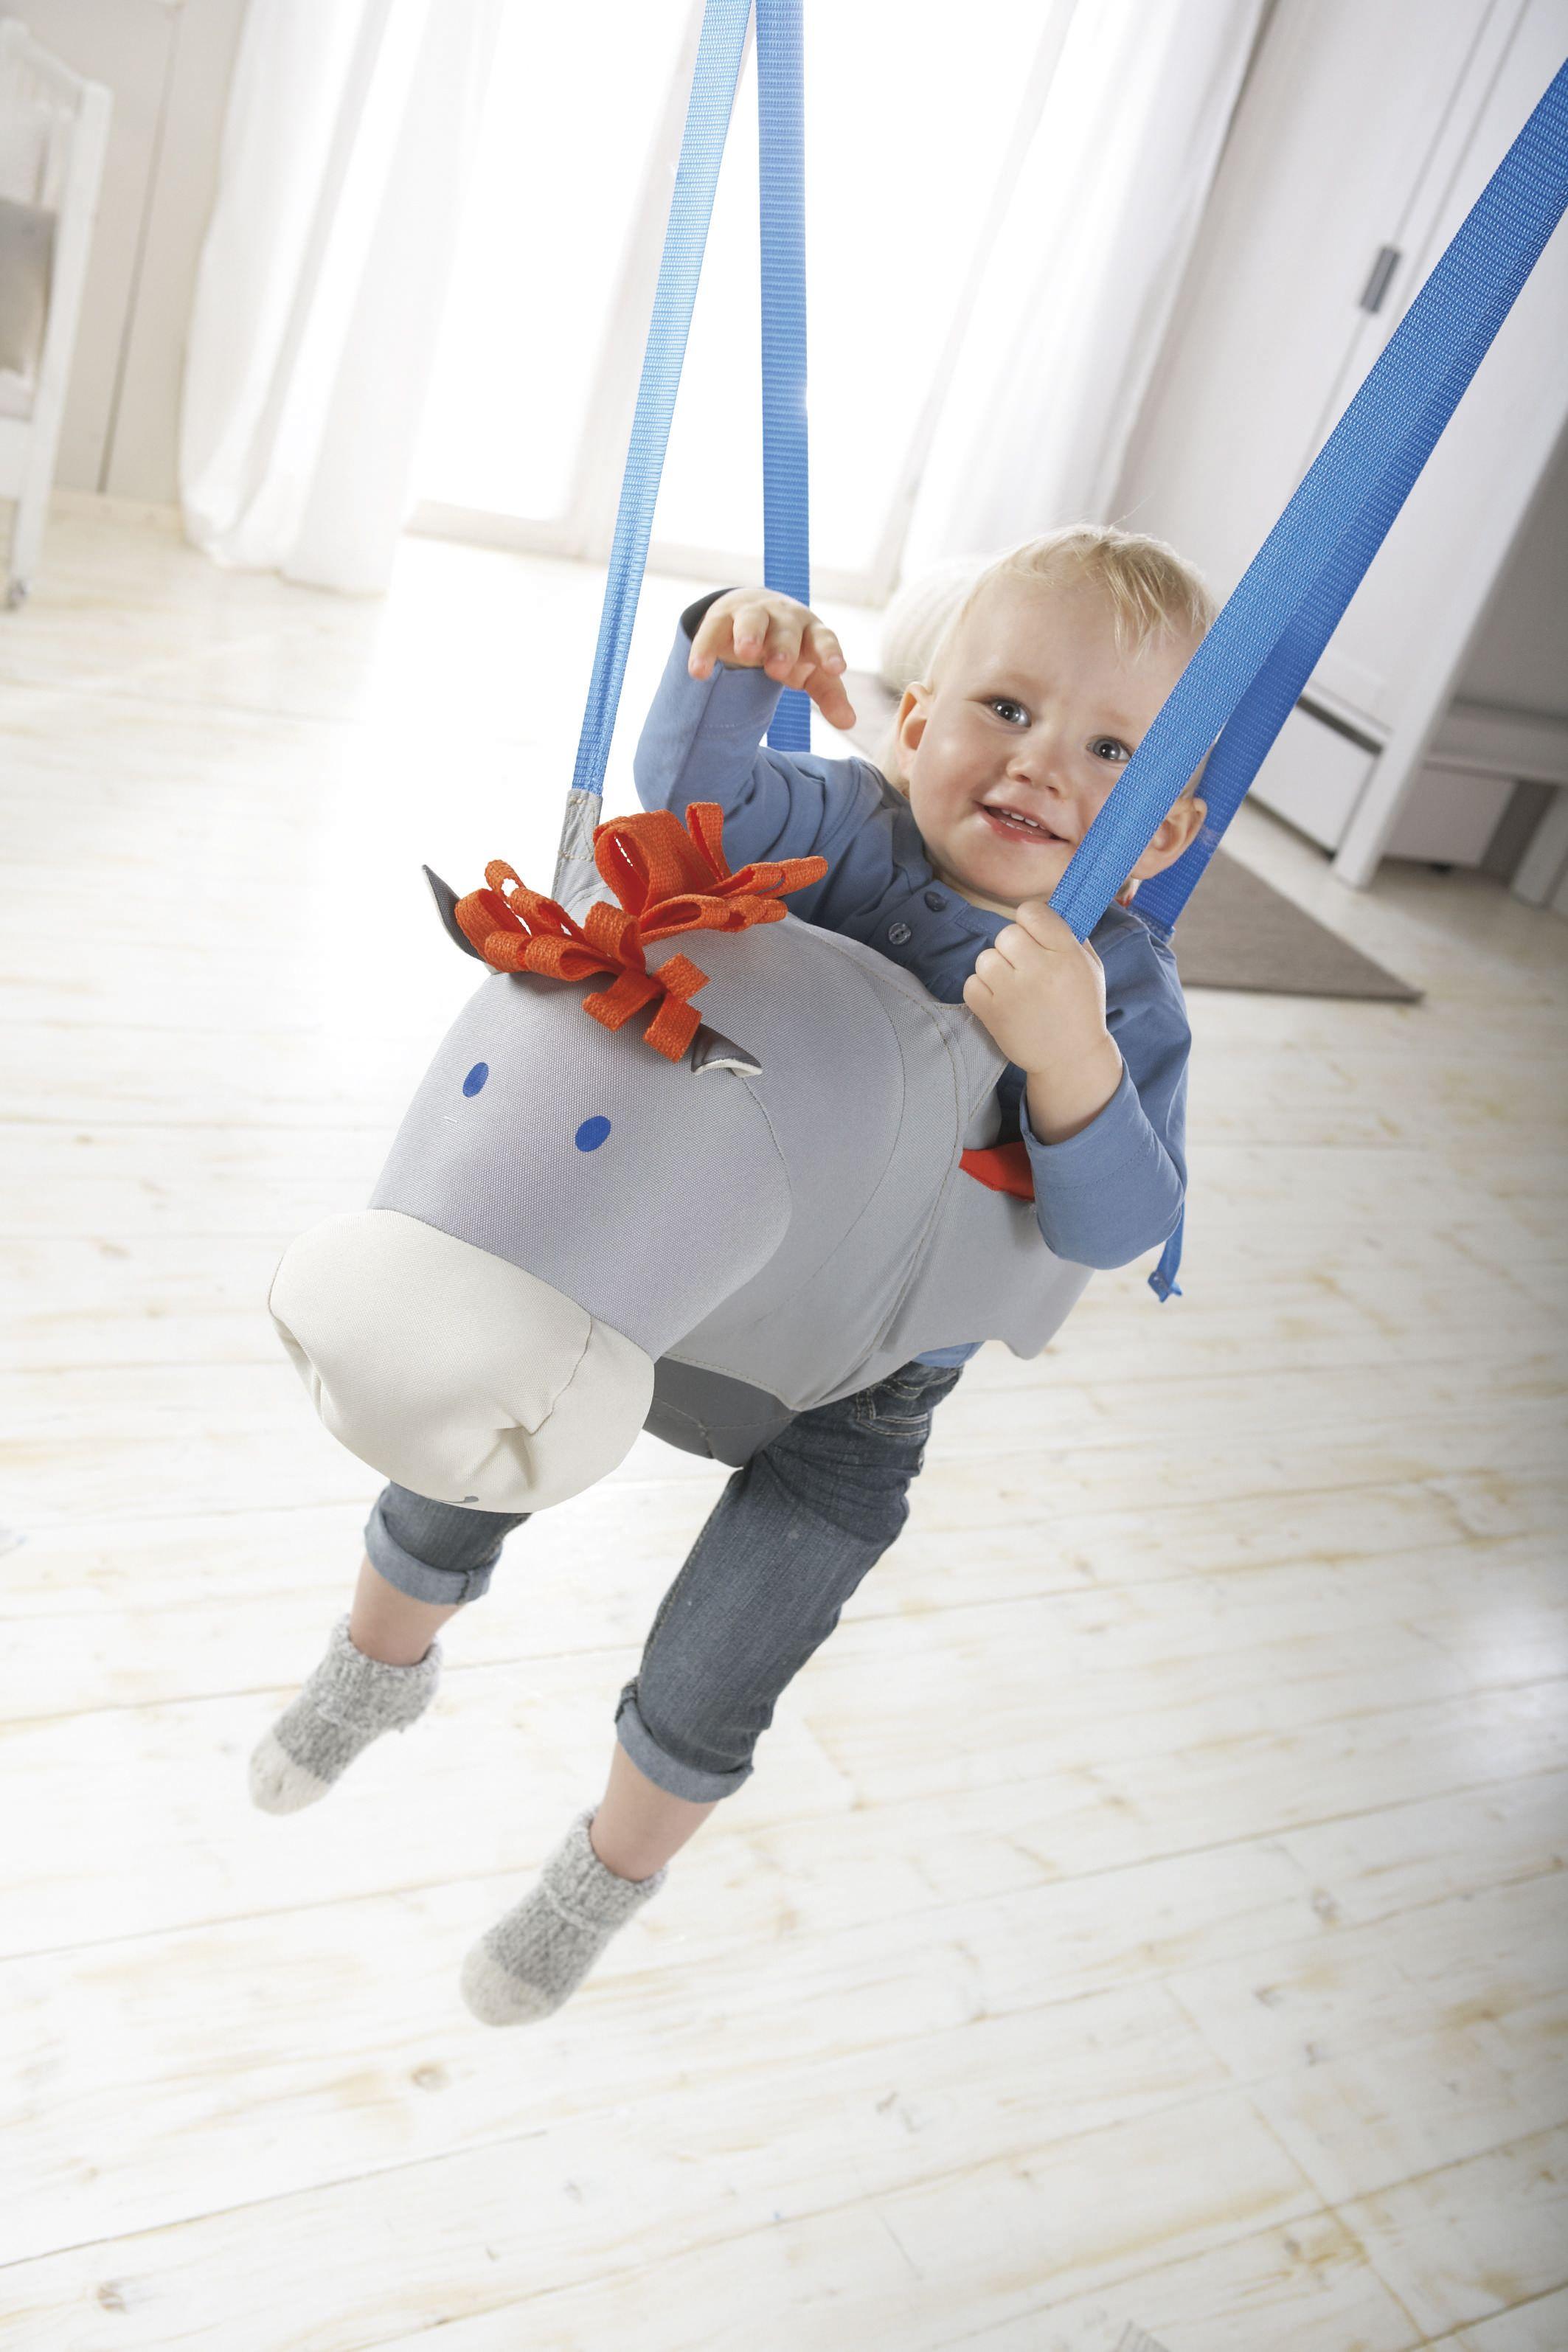 babyschaukel pferd babyschaukel kinderschaukel und. Black Bedroom Furniture Sets. Home Design Ideas